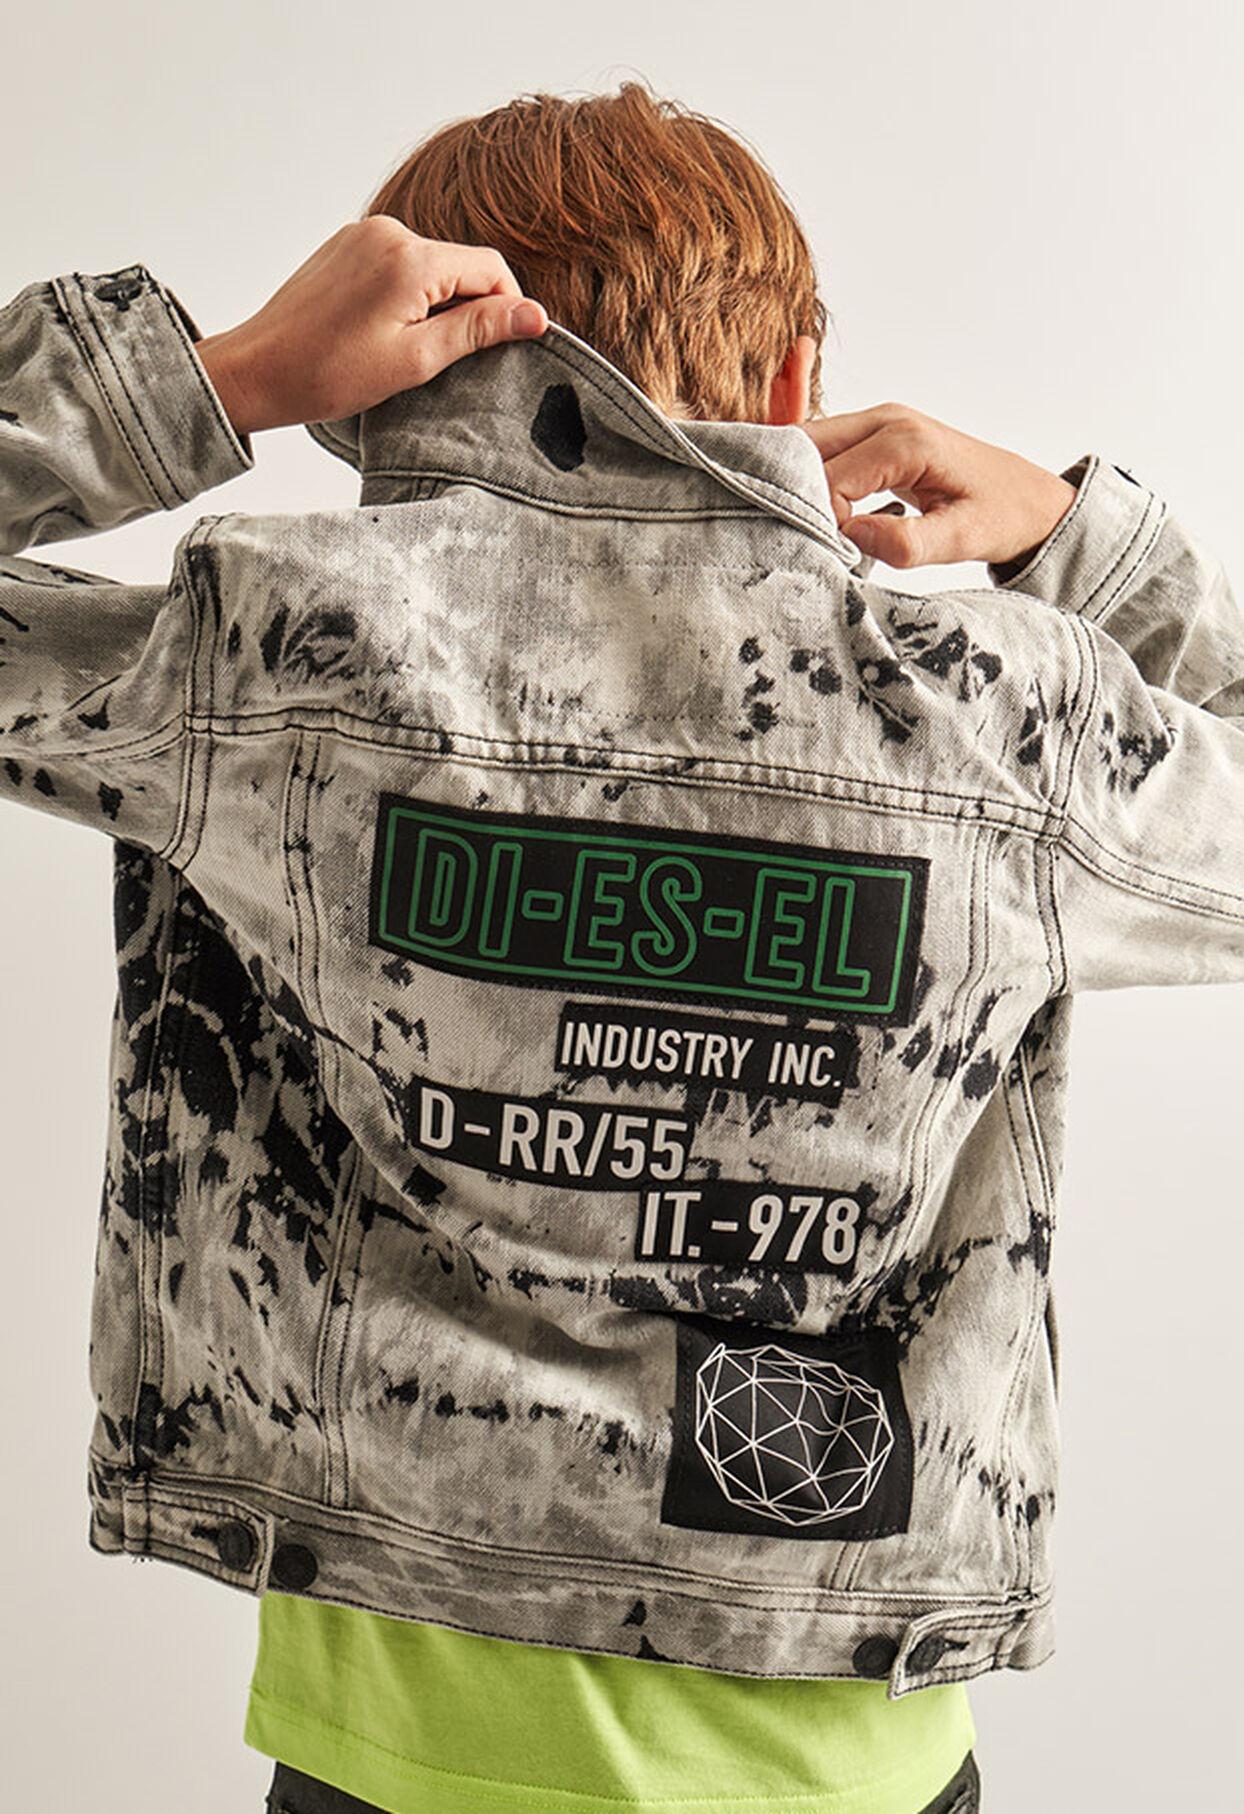 https://hu.diesel.com/dw/image/v2/BBLG_PRD/on/demandware.static/-/Library-Sites-DieselMFSharedLibrary/default/dw9fd09078/CATEGORYOV/2x2_90.jpg?sw=1244&sh=1814